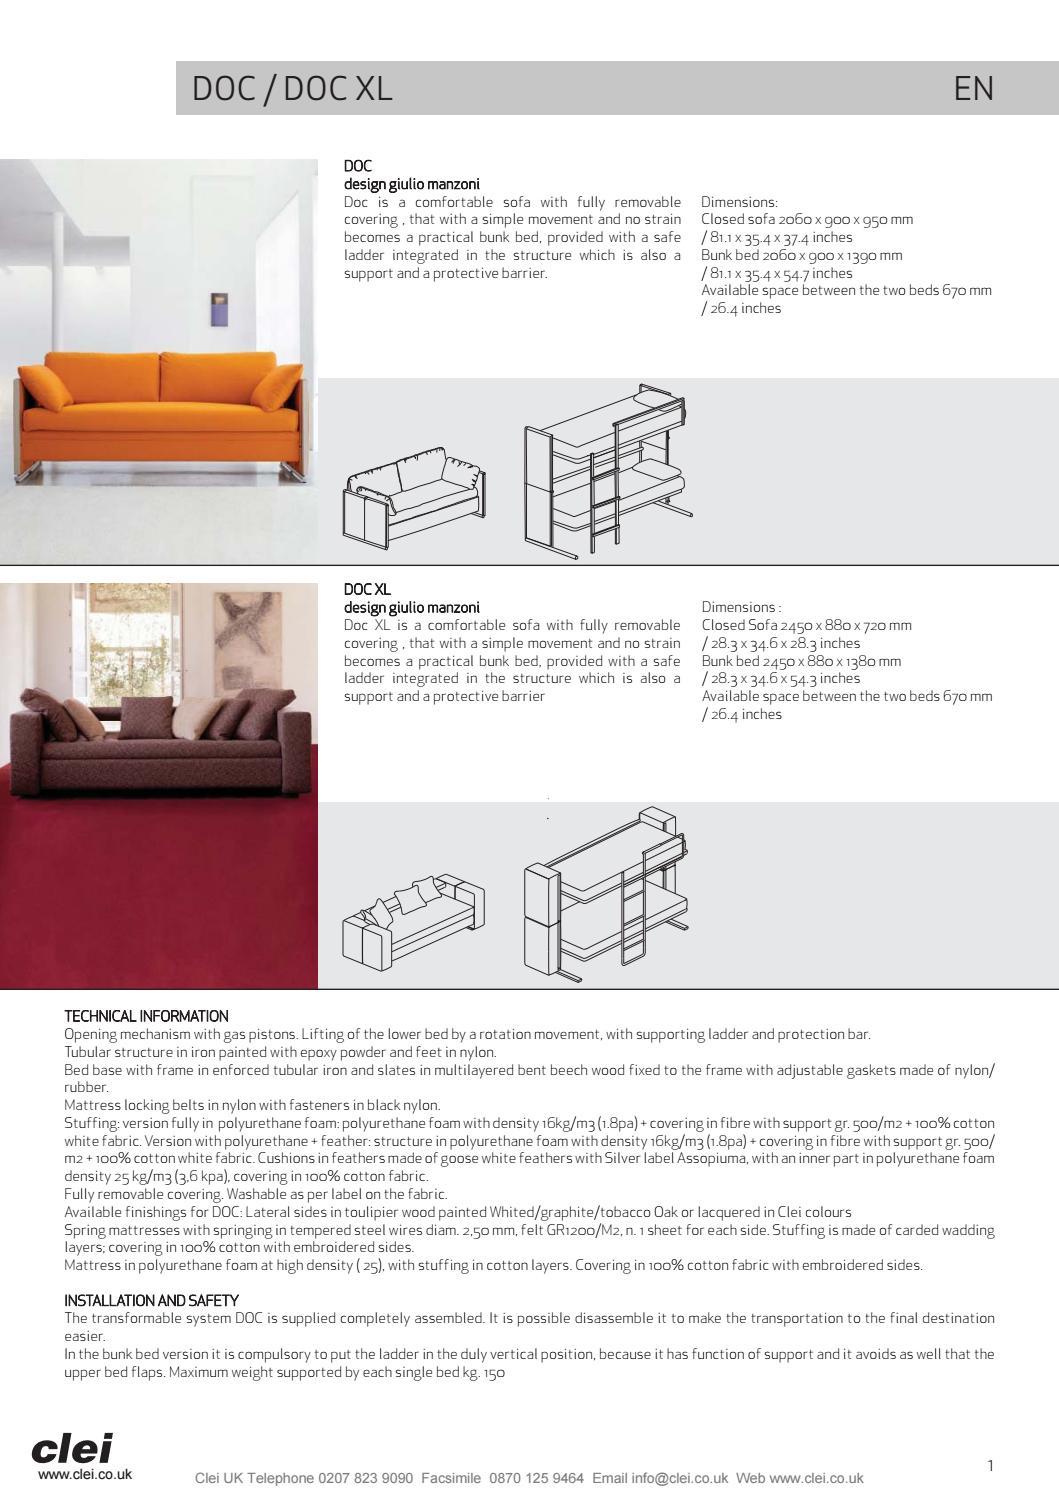 Enjoyable Doc Tec By Bonbon Compact Living Issuu Creativecarmelina Interior Chair Design Creativecarmelinacom